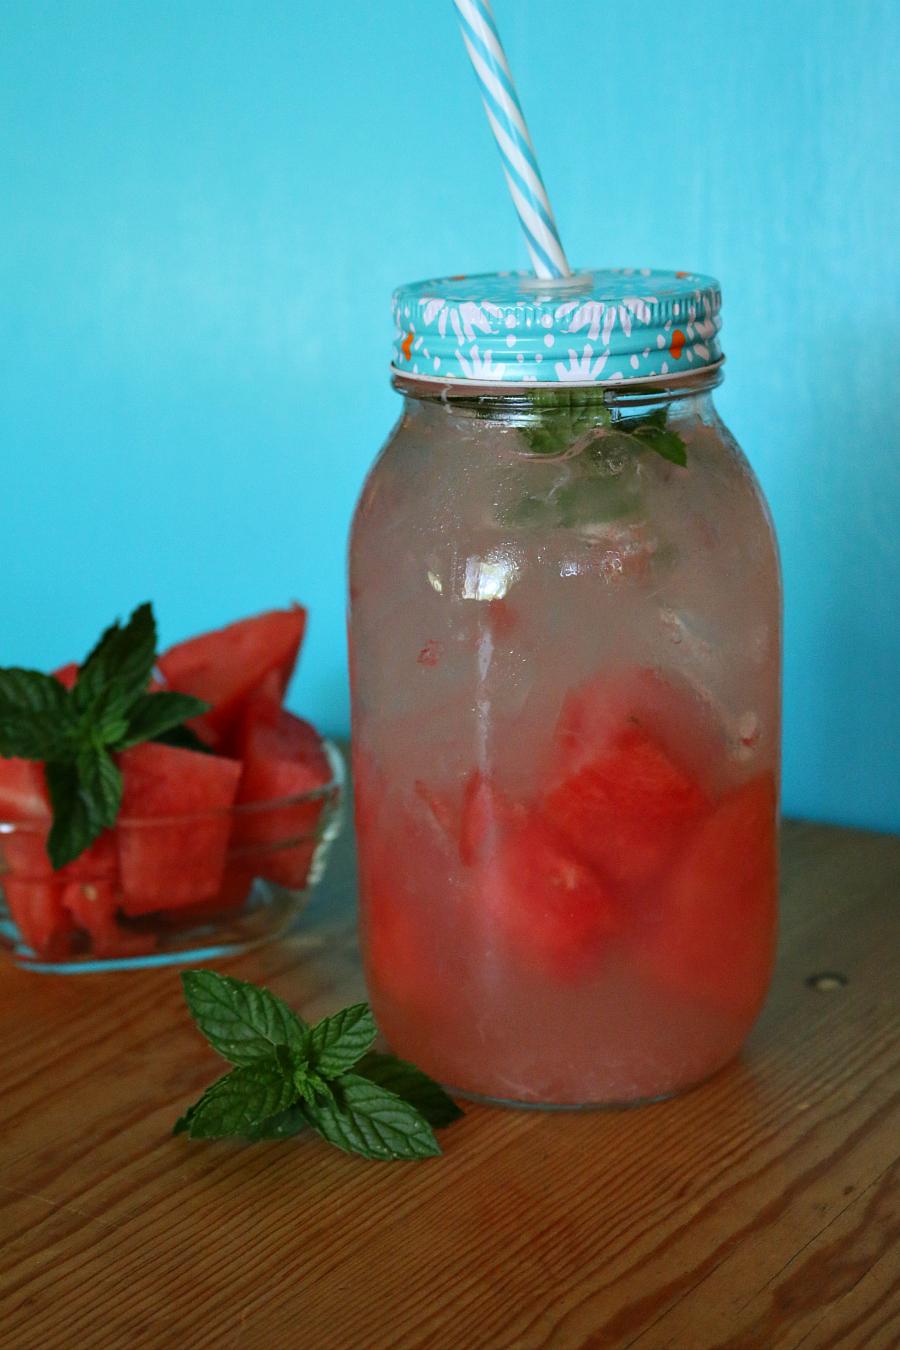 Watermelon Aqua Fresca a healthy, low carb summer drink. | CeceliasGoodStuff.com - Good Food for Good People |